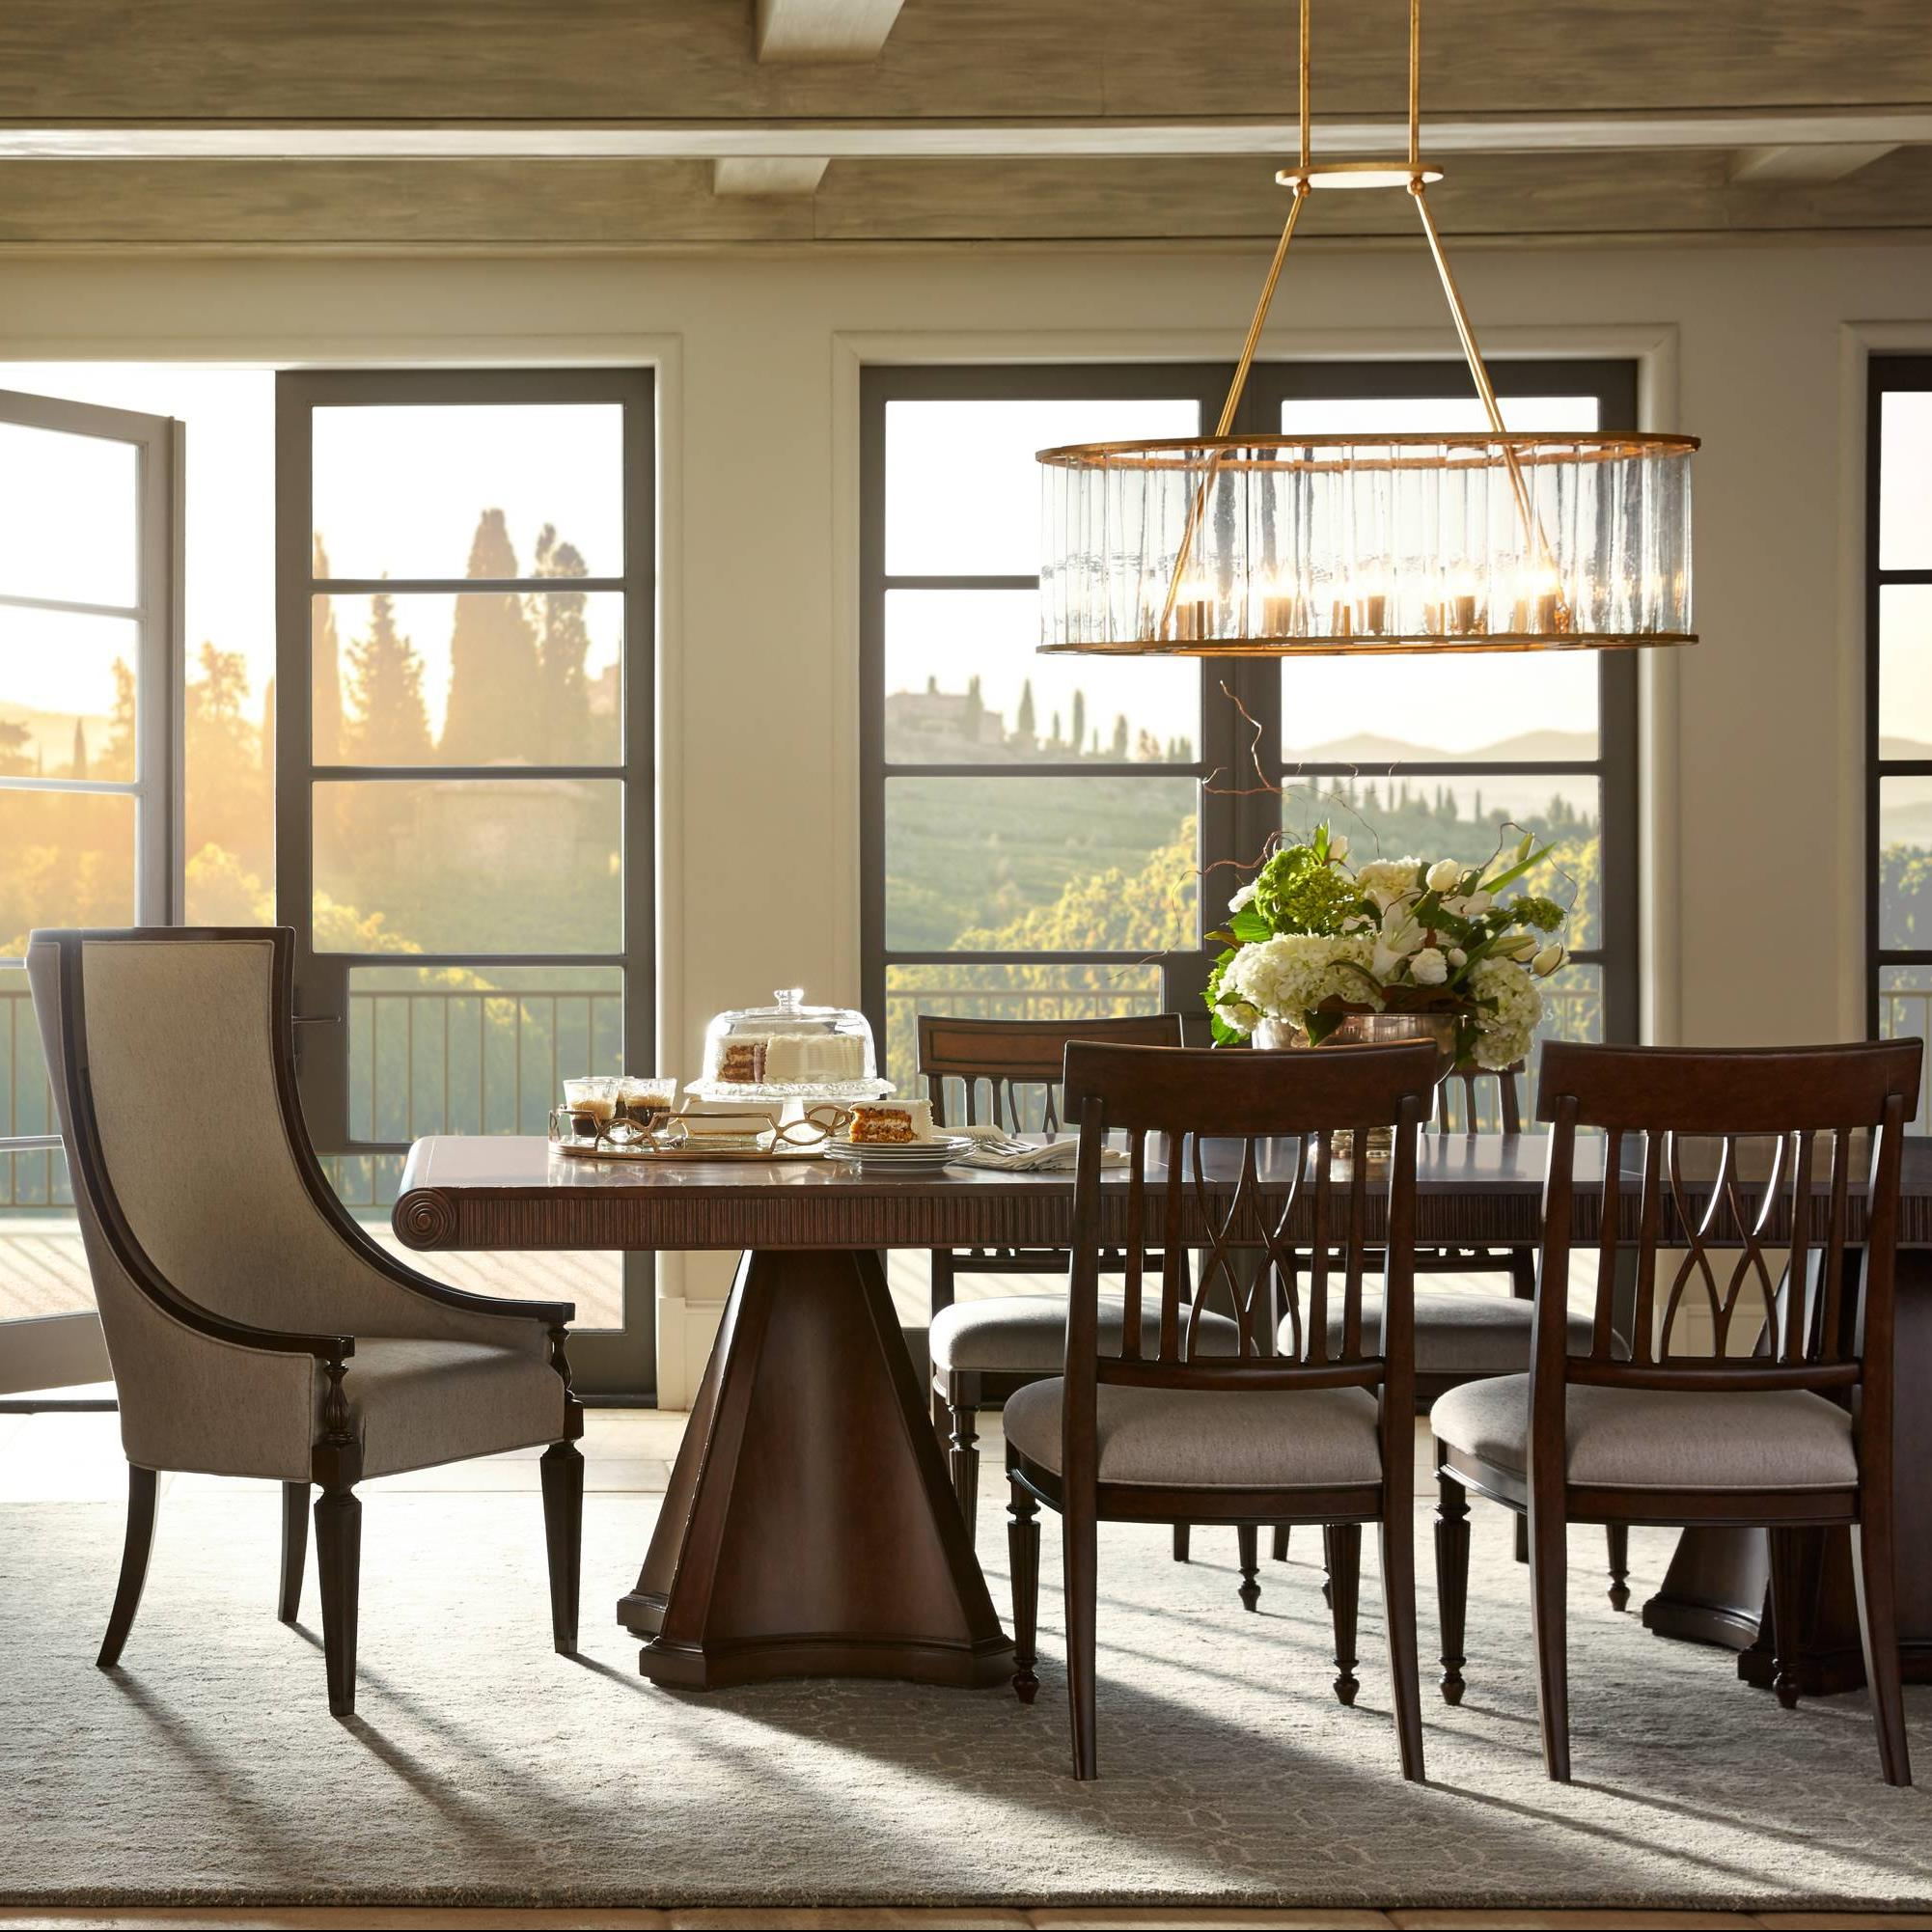 Stanley Furniture Villa Couture 7-Piece Dante Double Pedestal Table Set - Item Number: 510-11-36+2x75+4x60